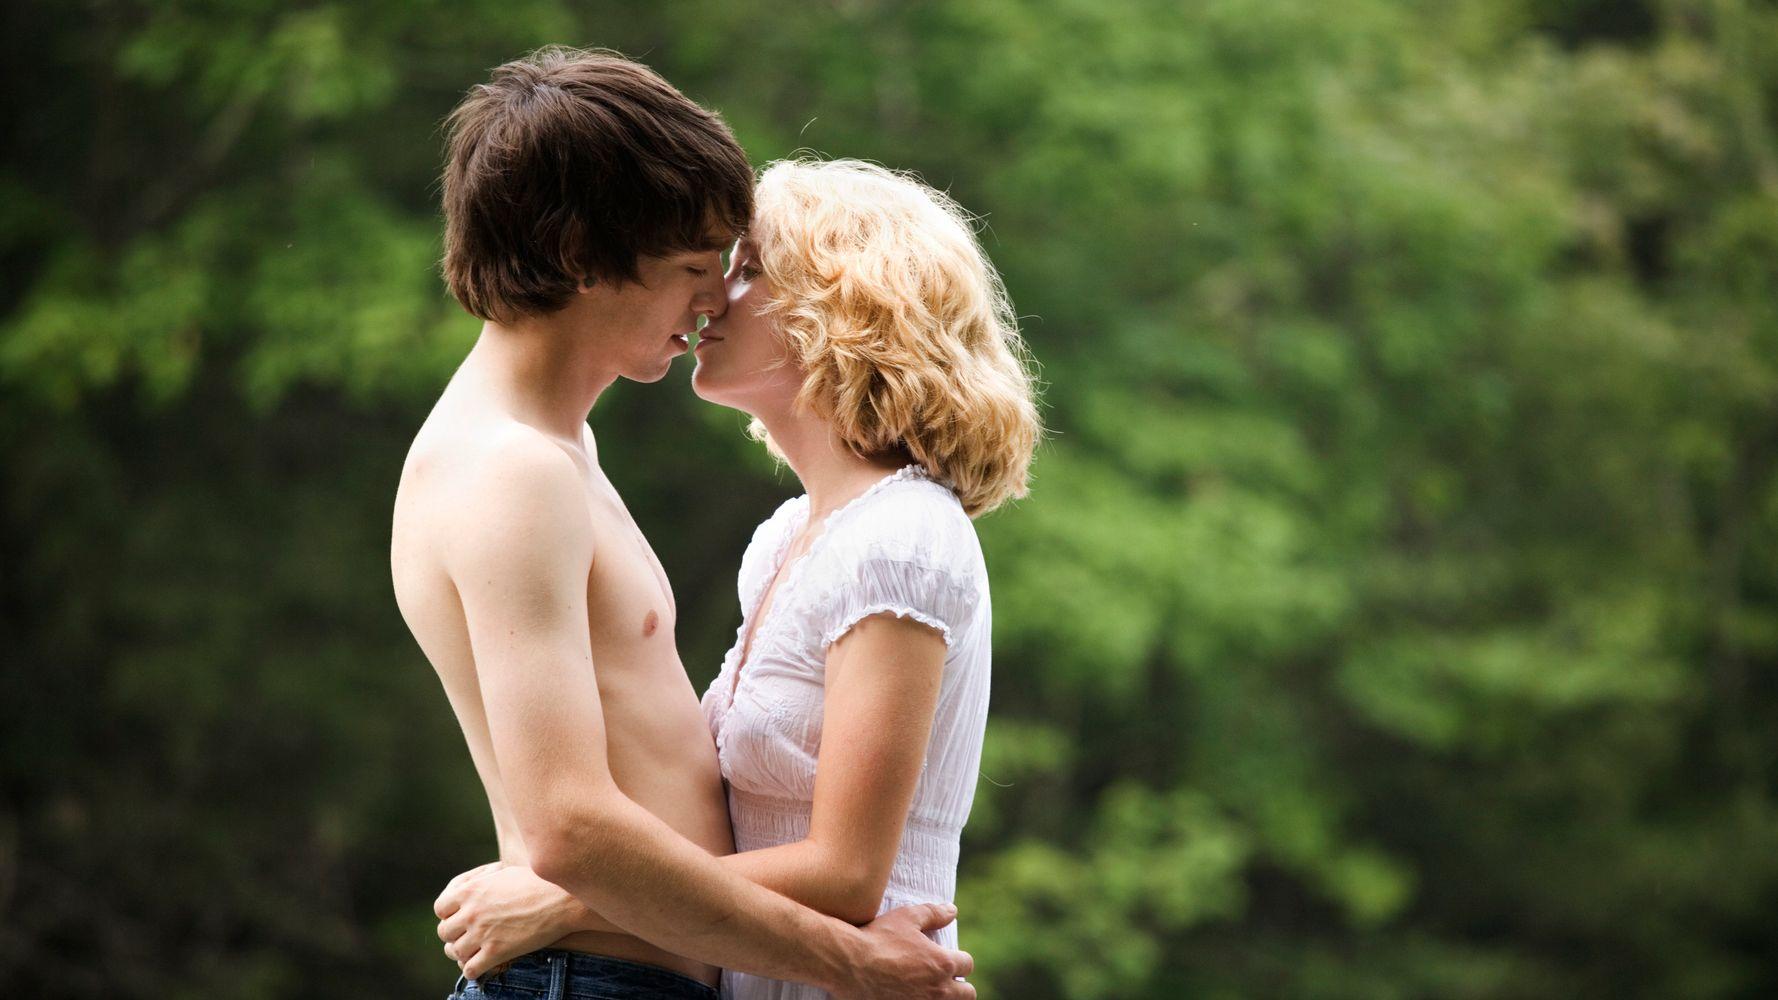 Young boy lovemaking, amateur teen girlfriend naked